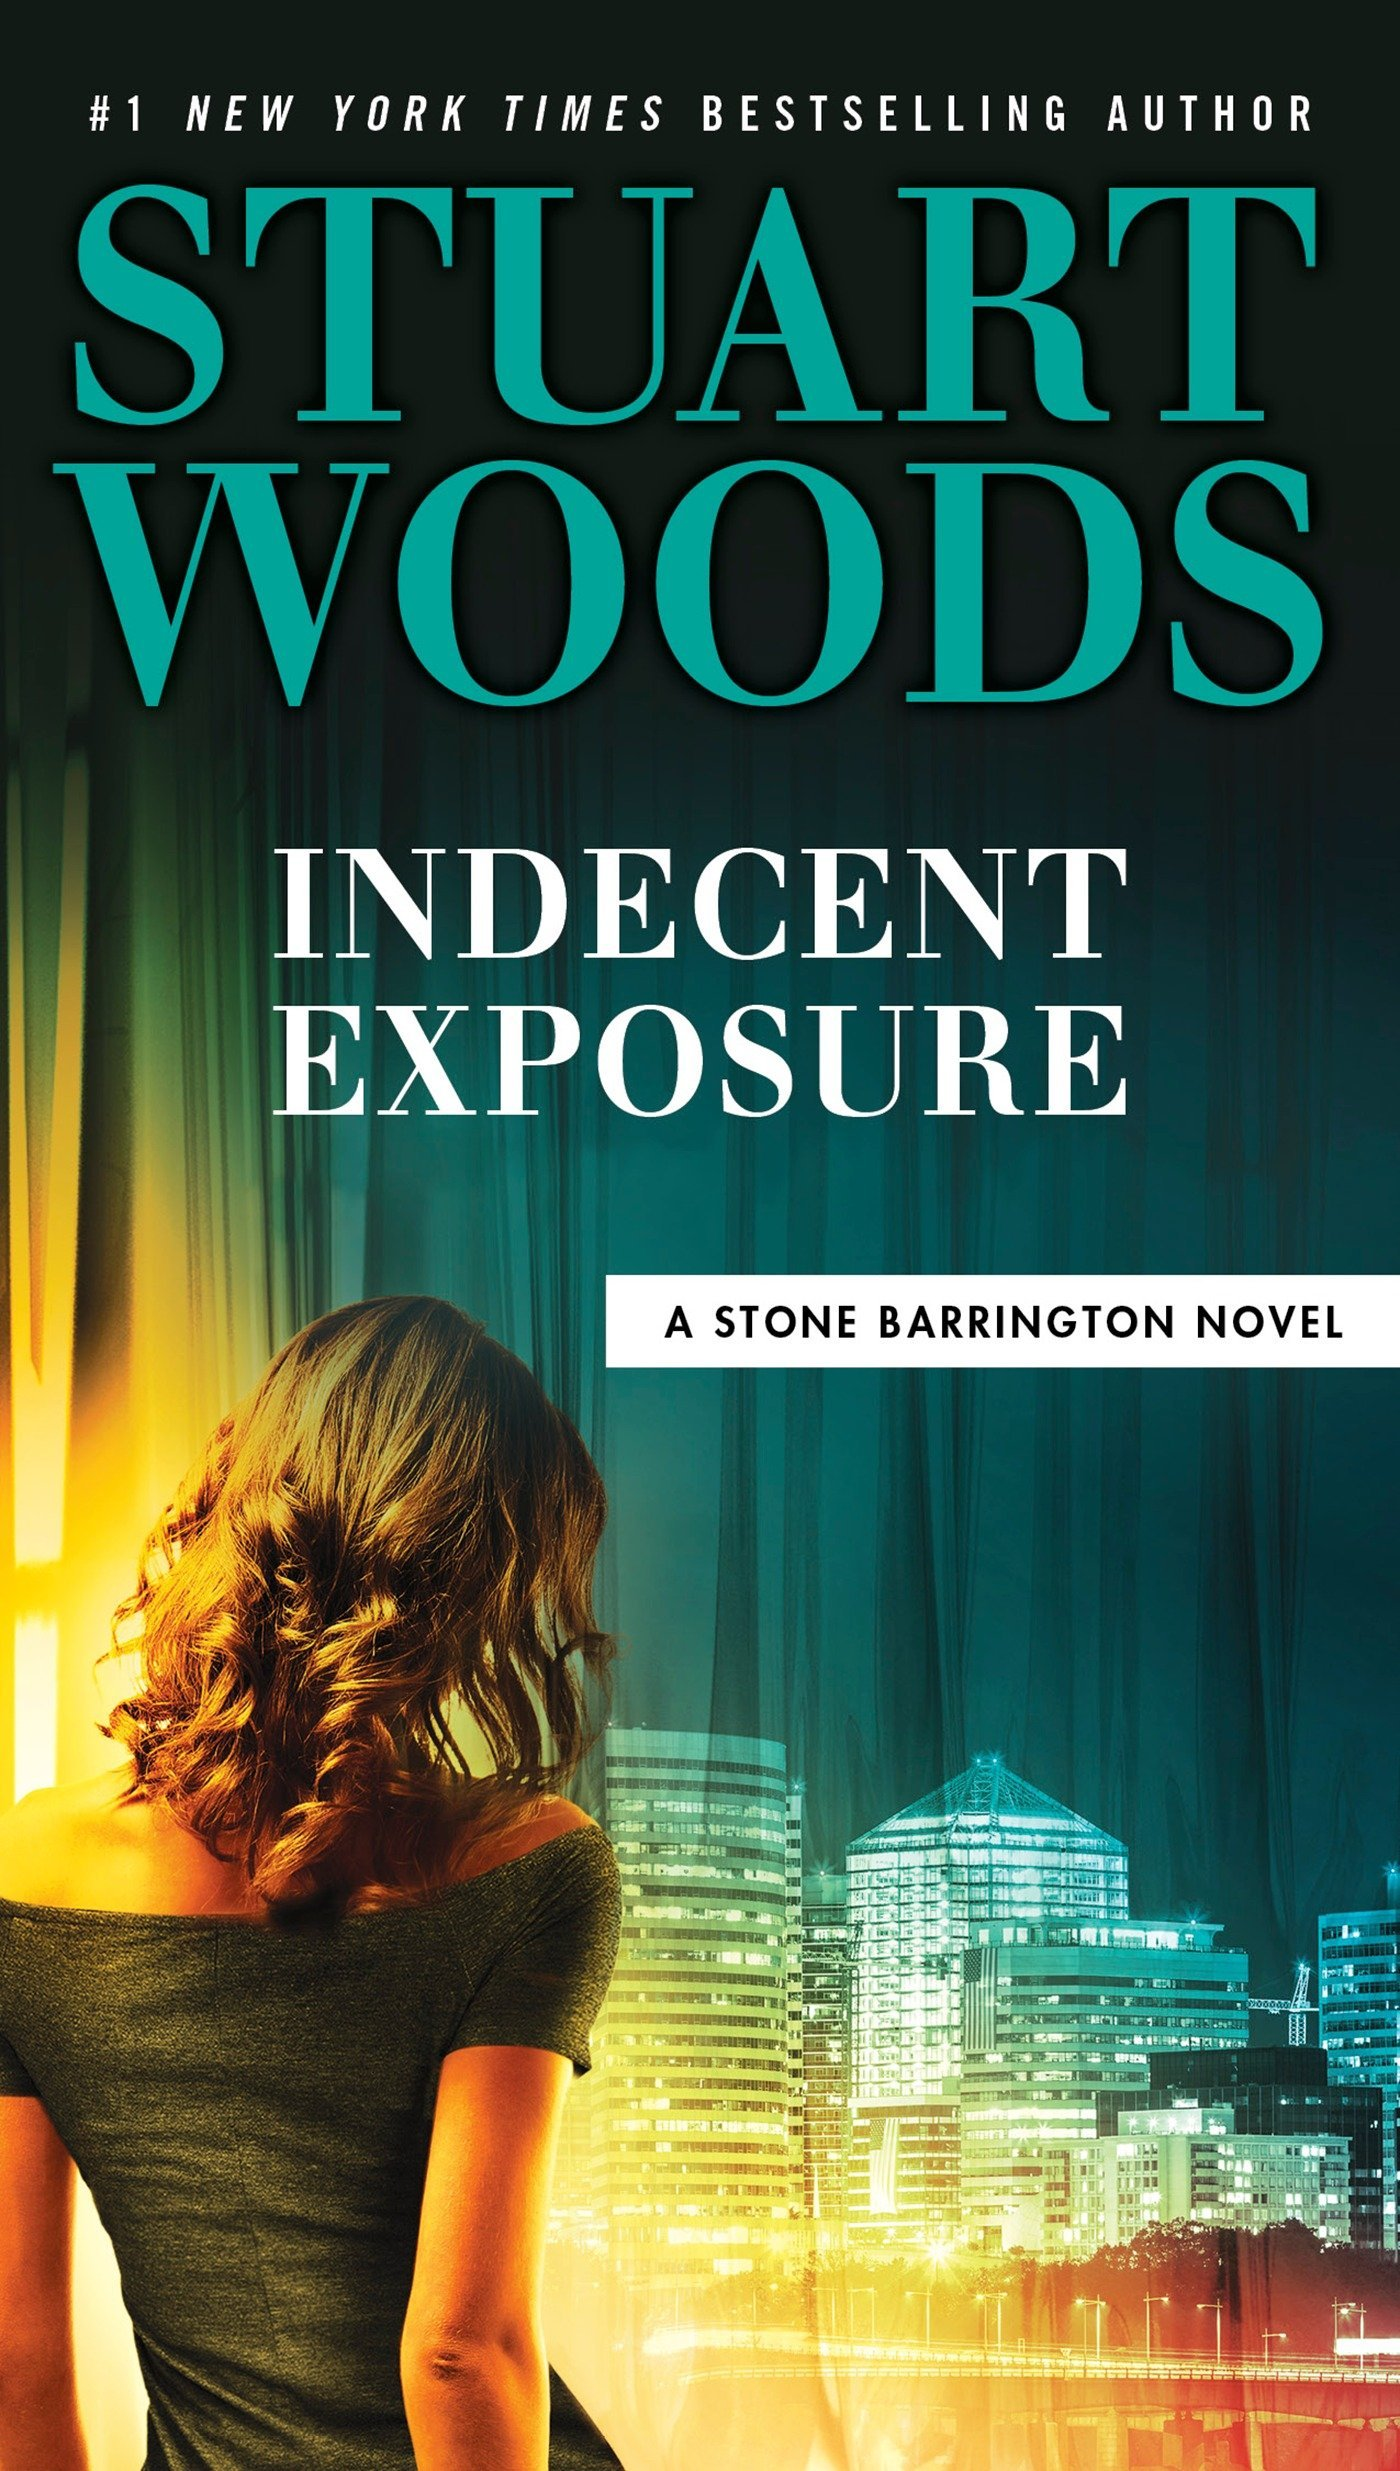 Amazon.com: Indecent Exposure (A Stone Barrington Novel ...